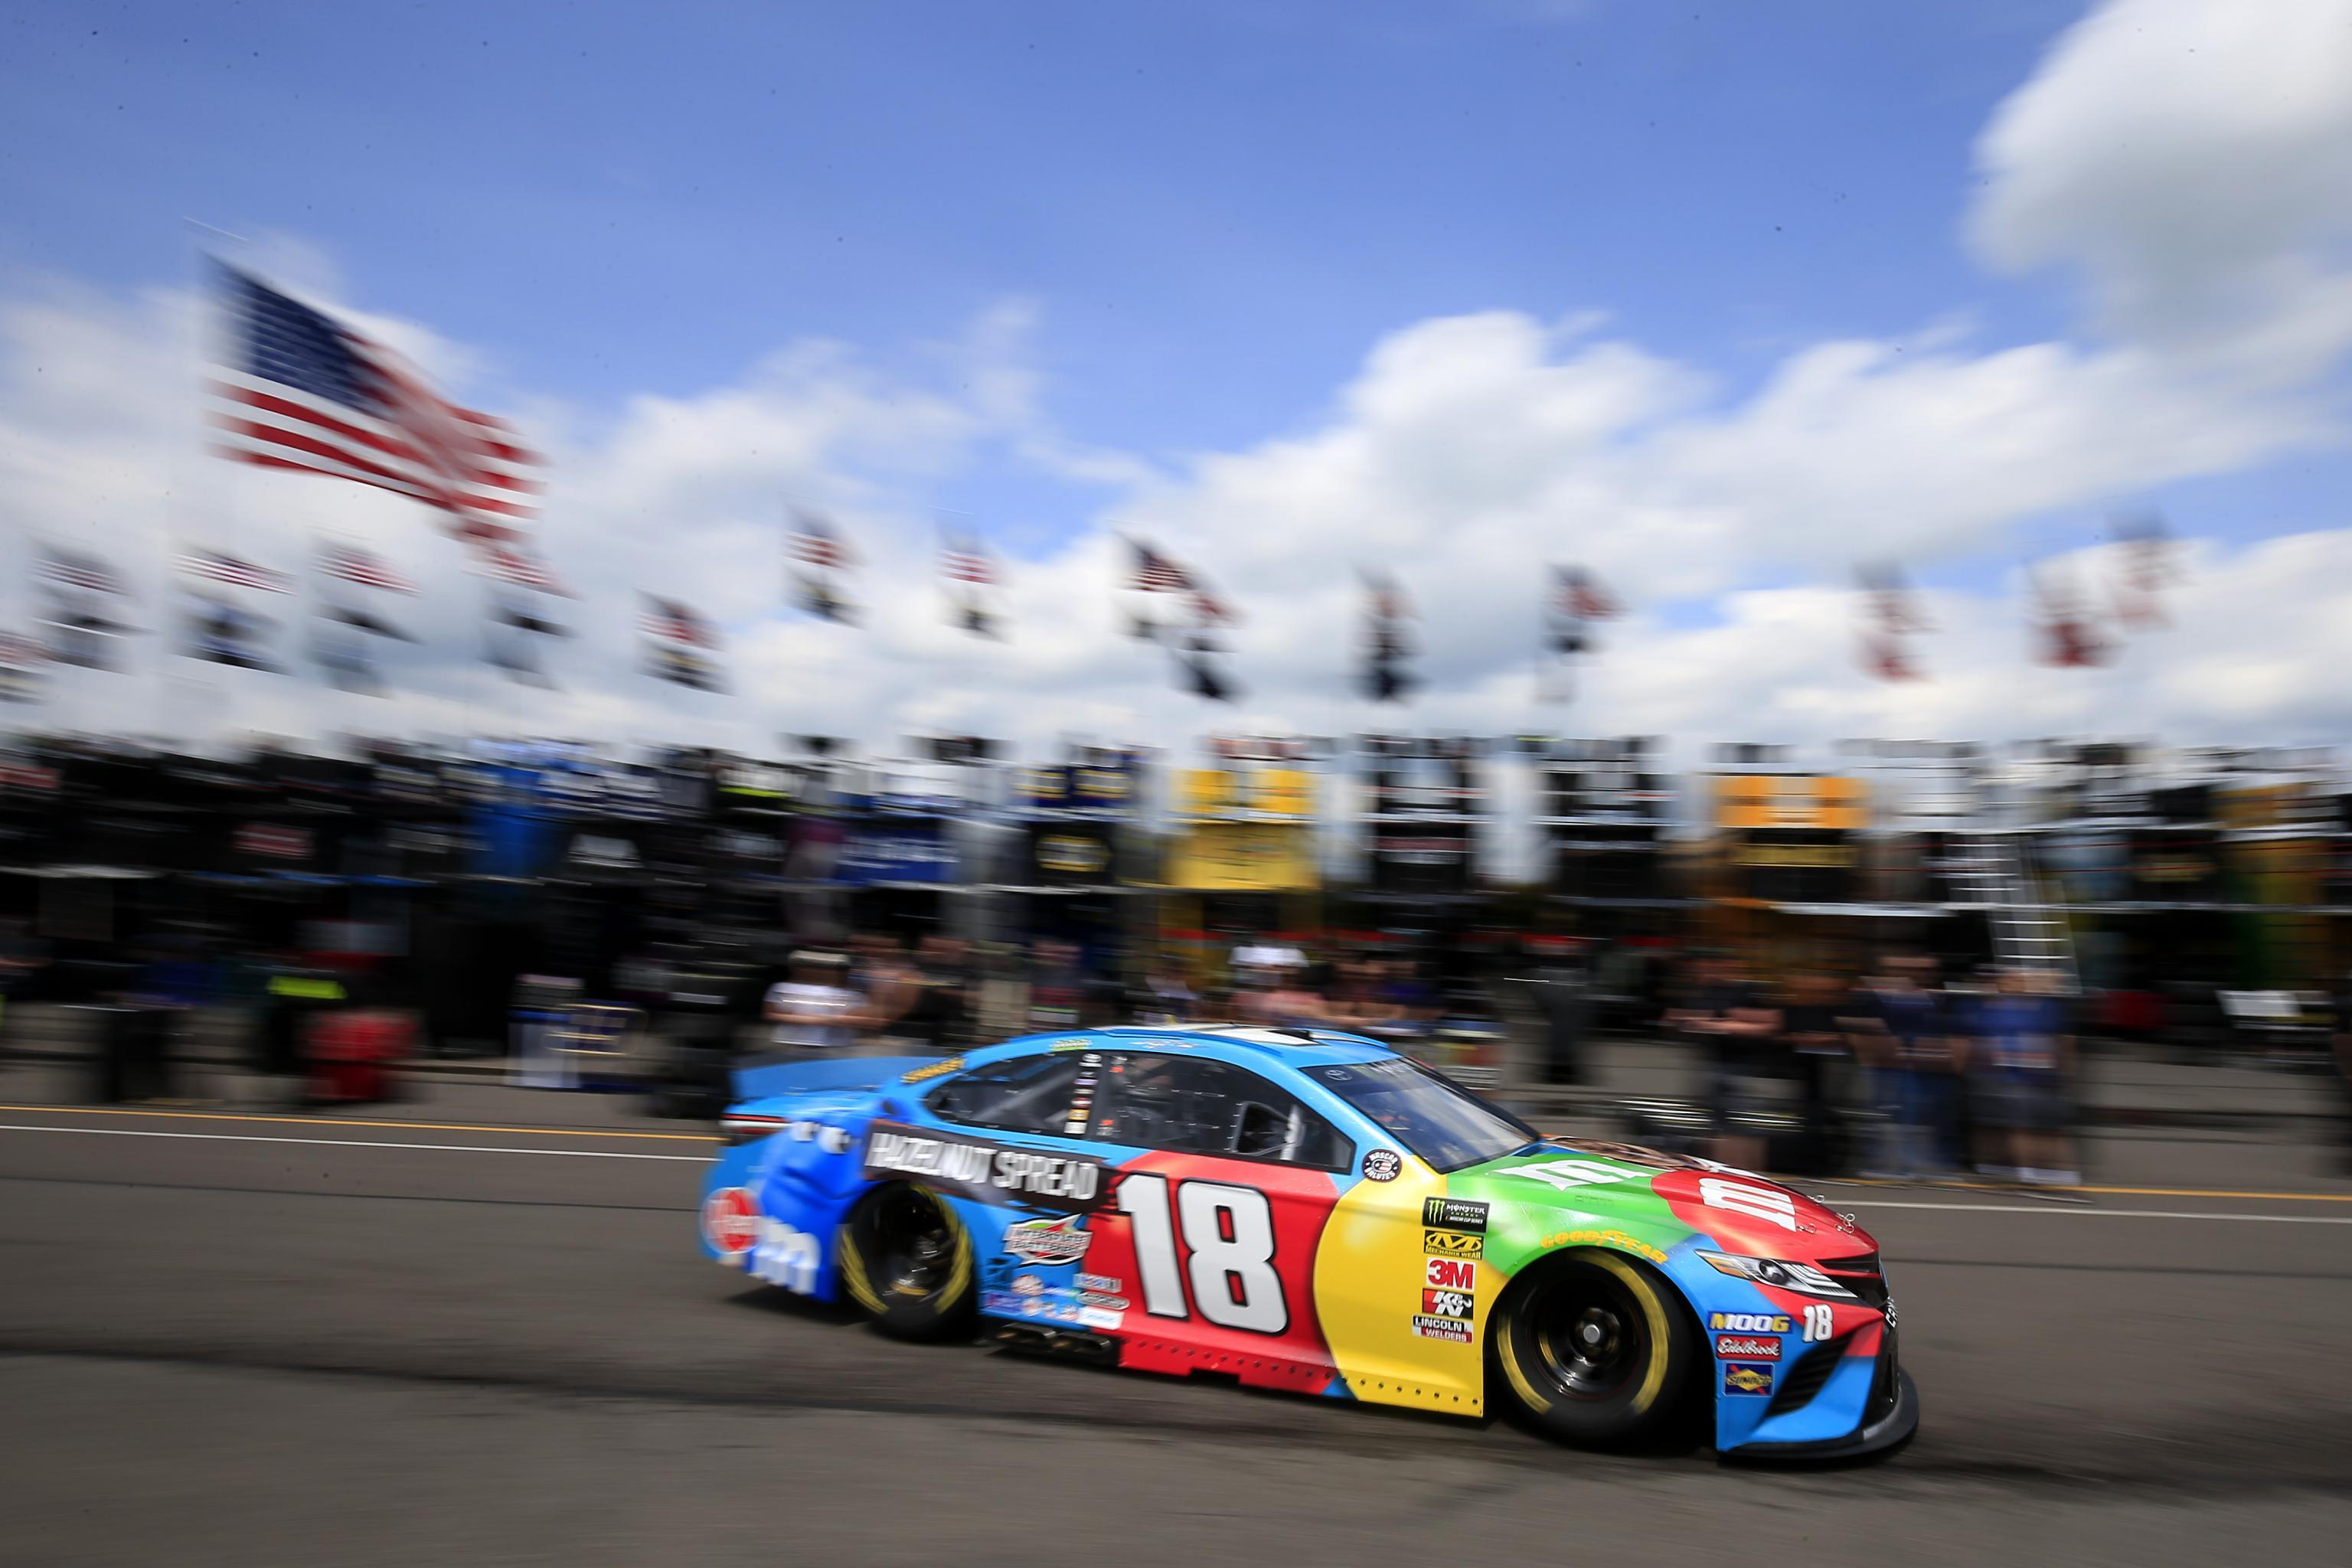 NASCAR at Pocono 2019: Start Time, Ticket Info, Lineup, TV Schedule